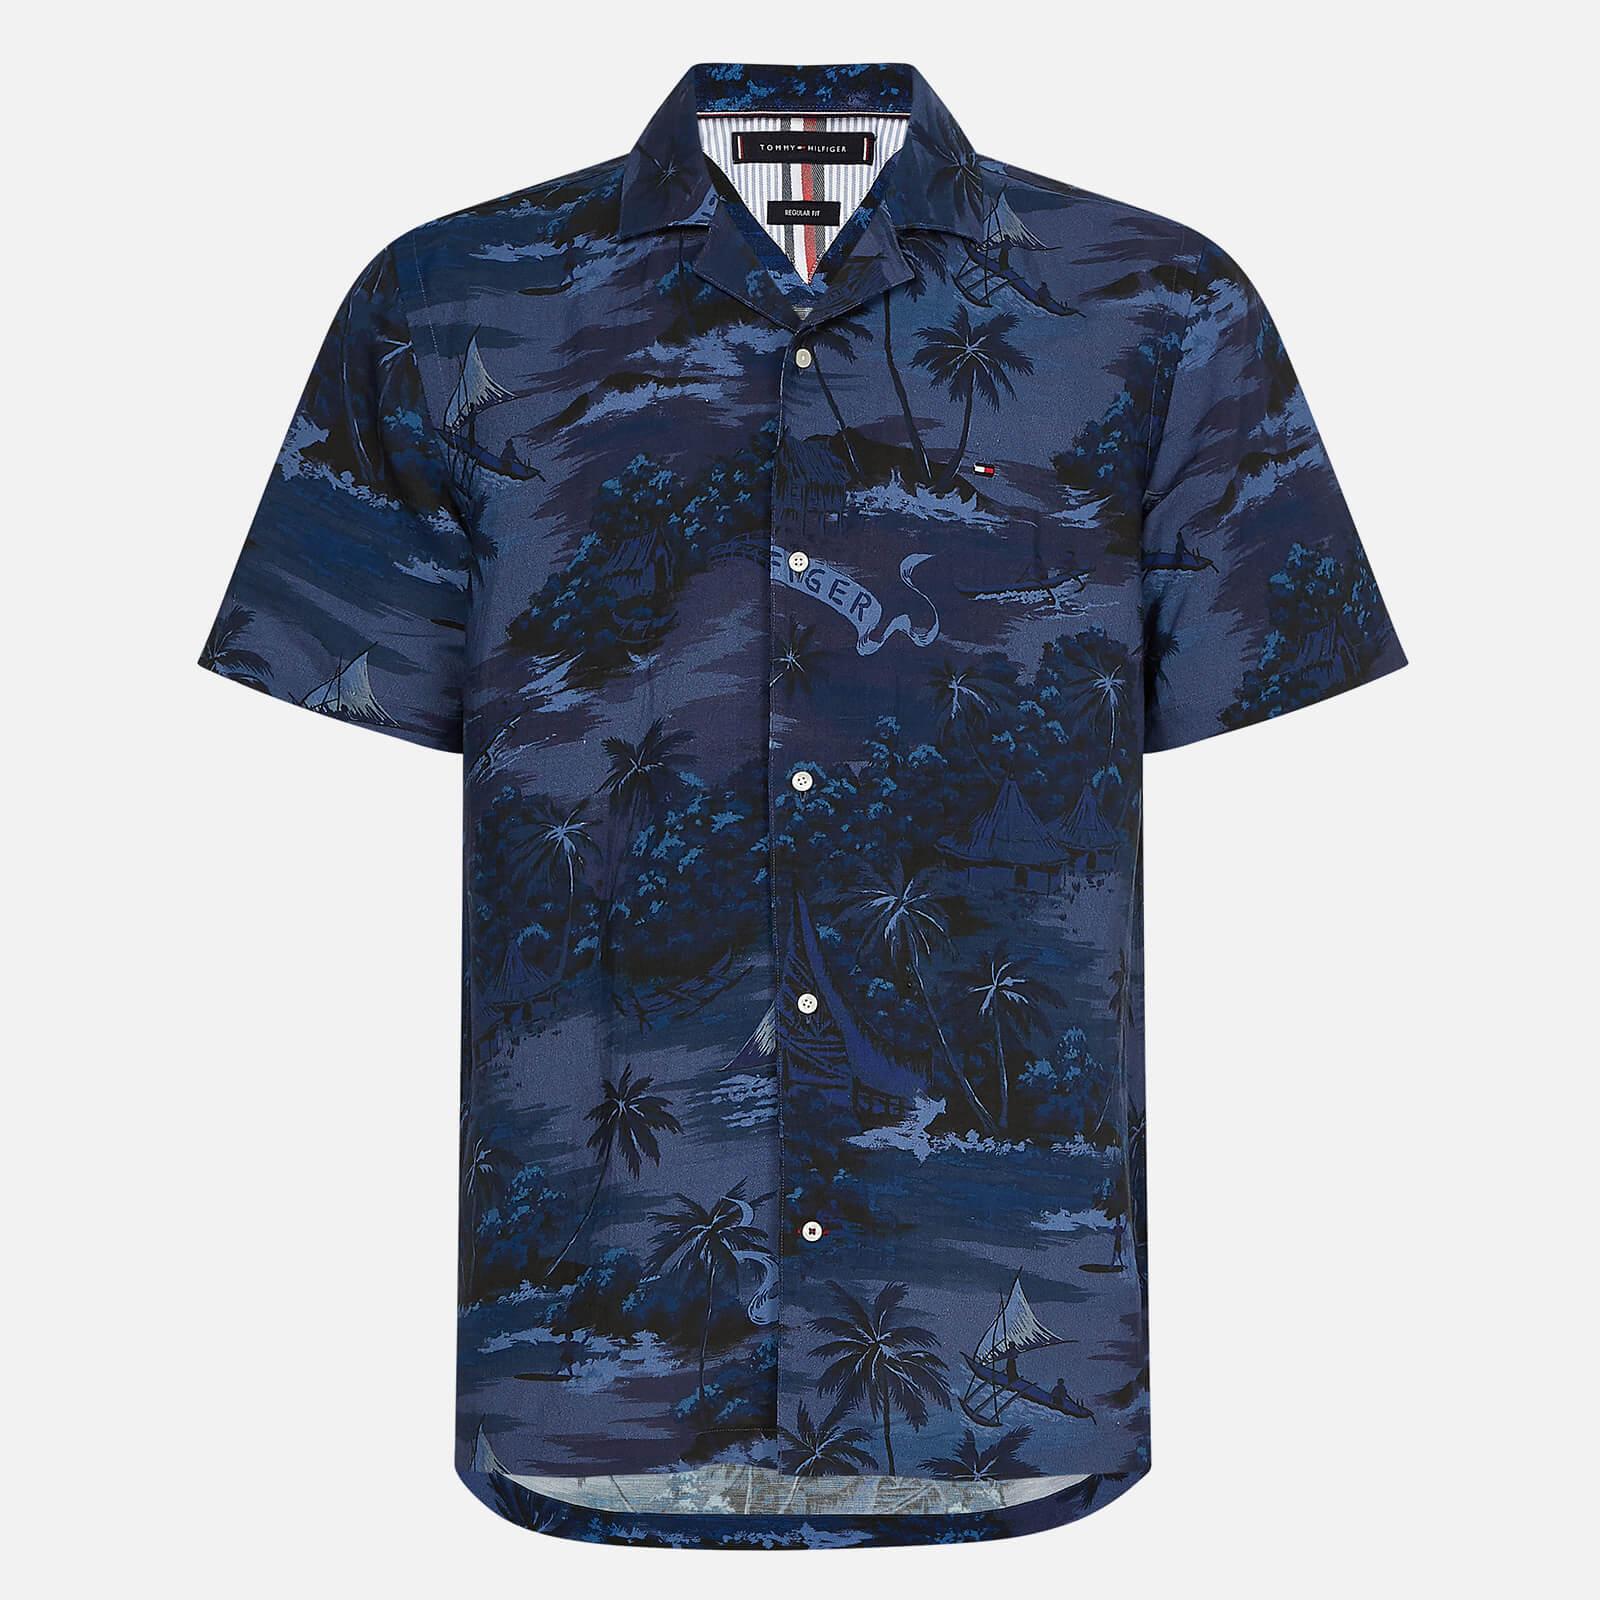 Tommy Hilfiger Men's Hawaiian Print Short Sleeve Shirt - Tonal Blues - S